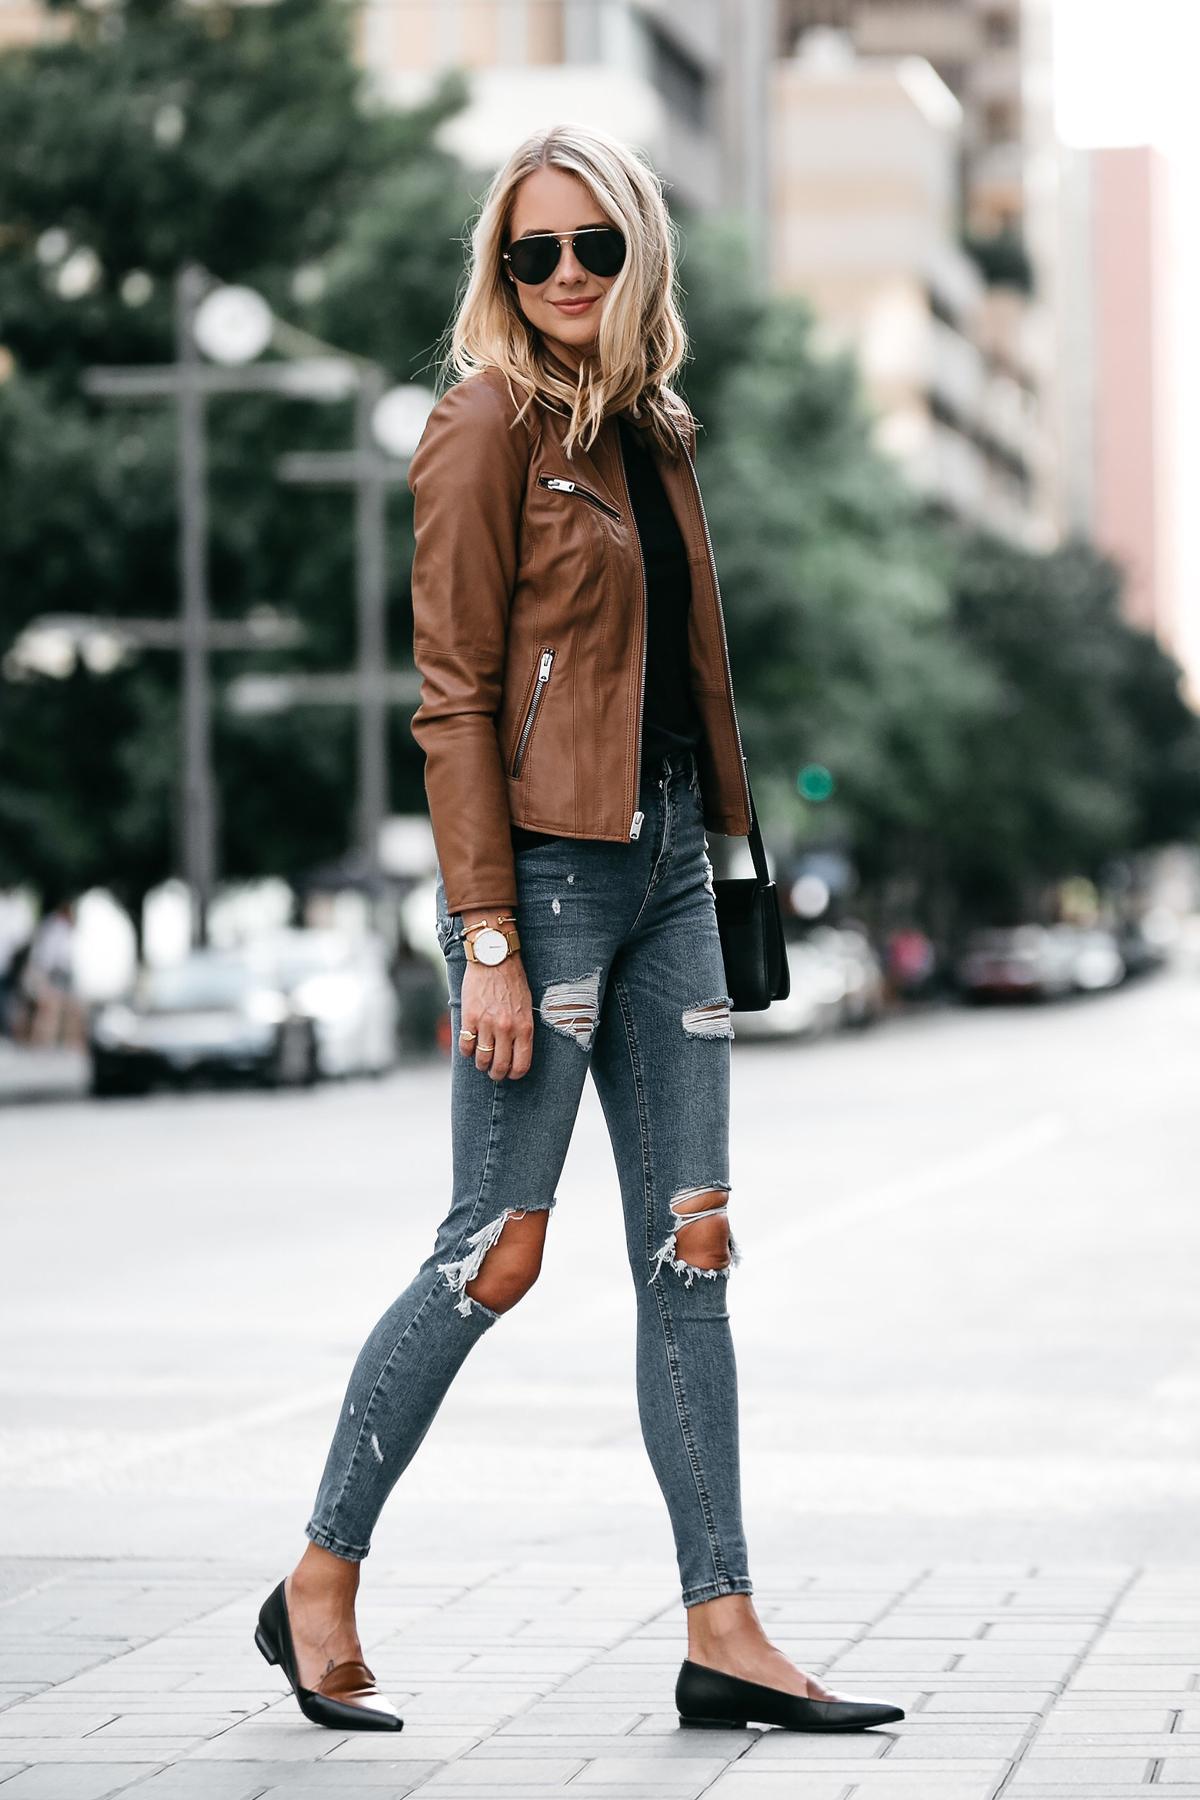 Blonde Woman Wearing Tan Leather Jacket Black Tshirt Denim Ripped Skinny Jeans Outfit Black Tan Loafers Chloe Faye Handbag Fashion Jackson Dallas Blogger Fashion Blogger Street Style